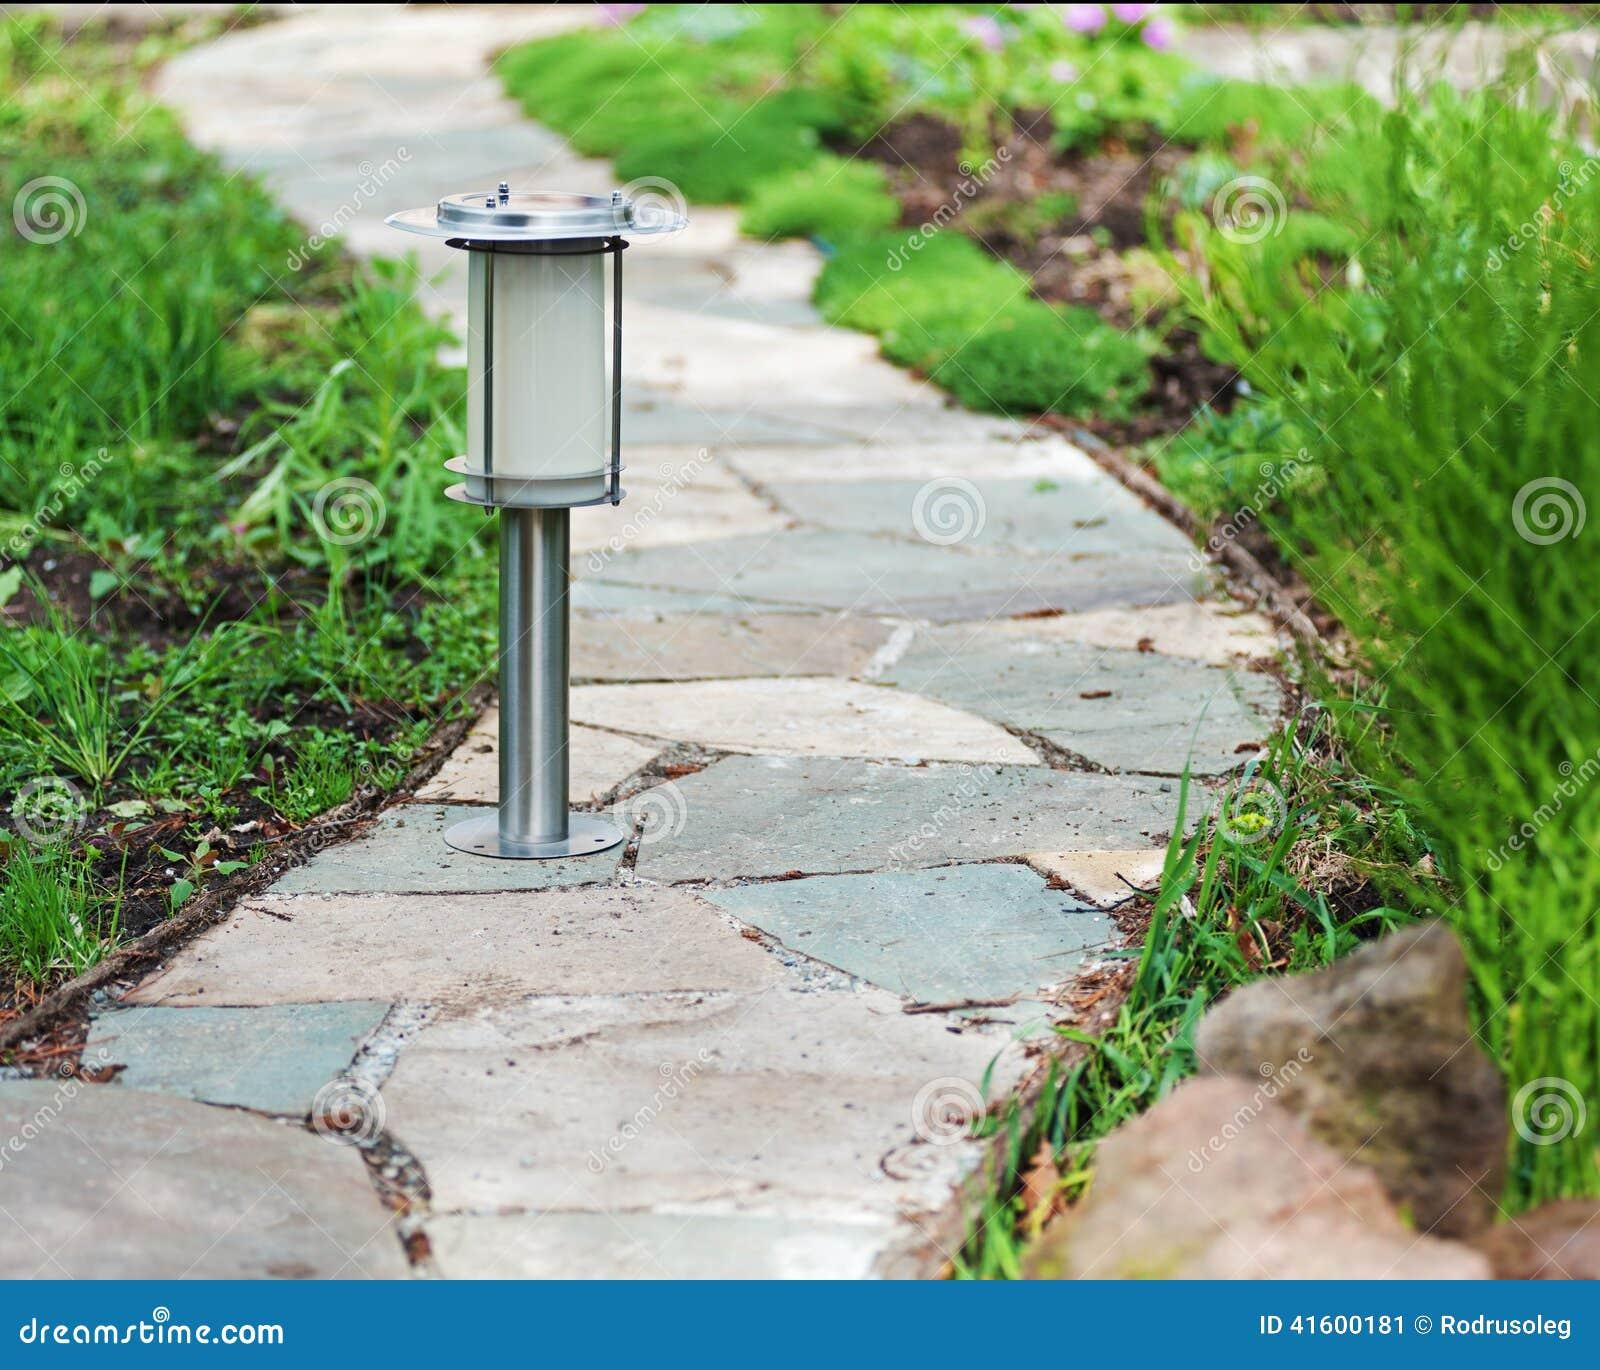 Lampade solari ikea lampade da giardino leroy merlin lampade solari da giardino ikea idee di - Lampada energia solare ikea ...